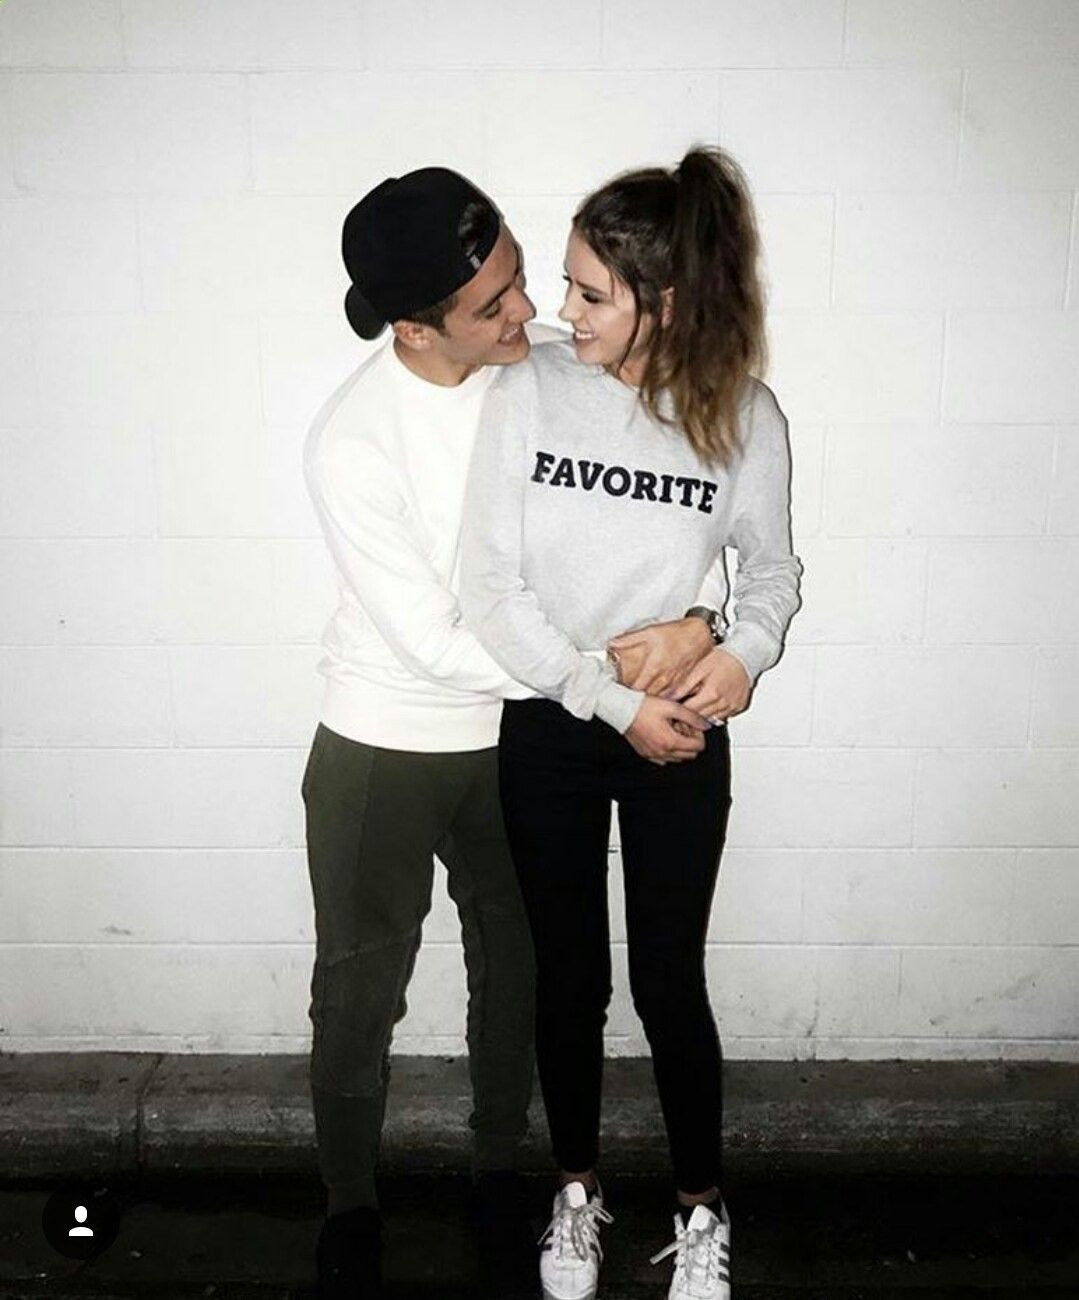 couples Cute teen